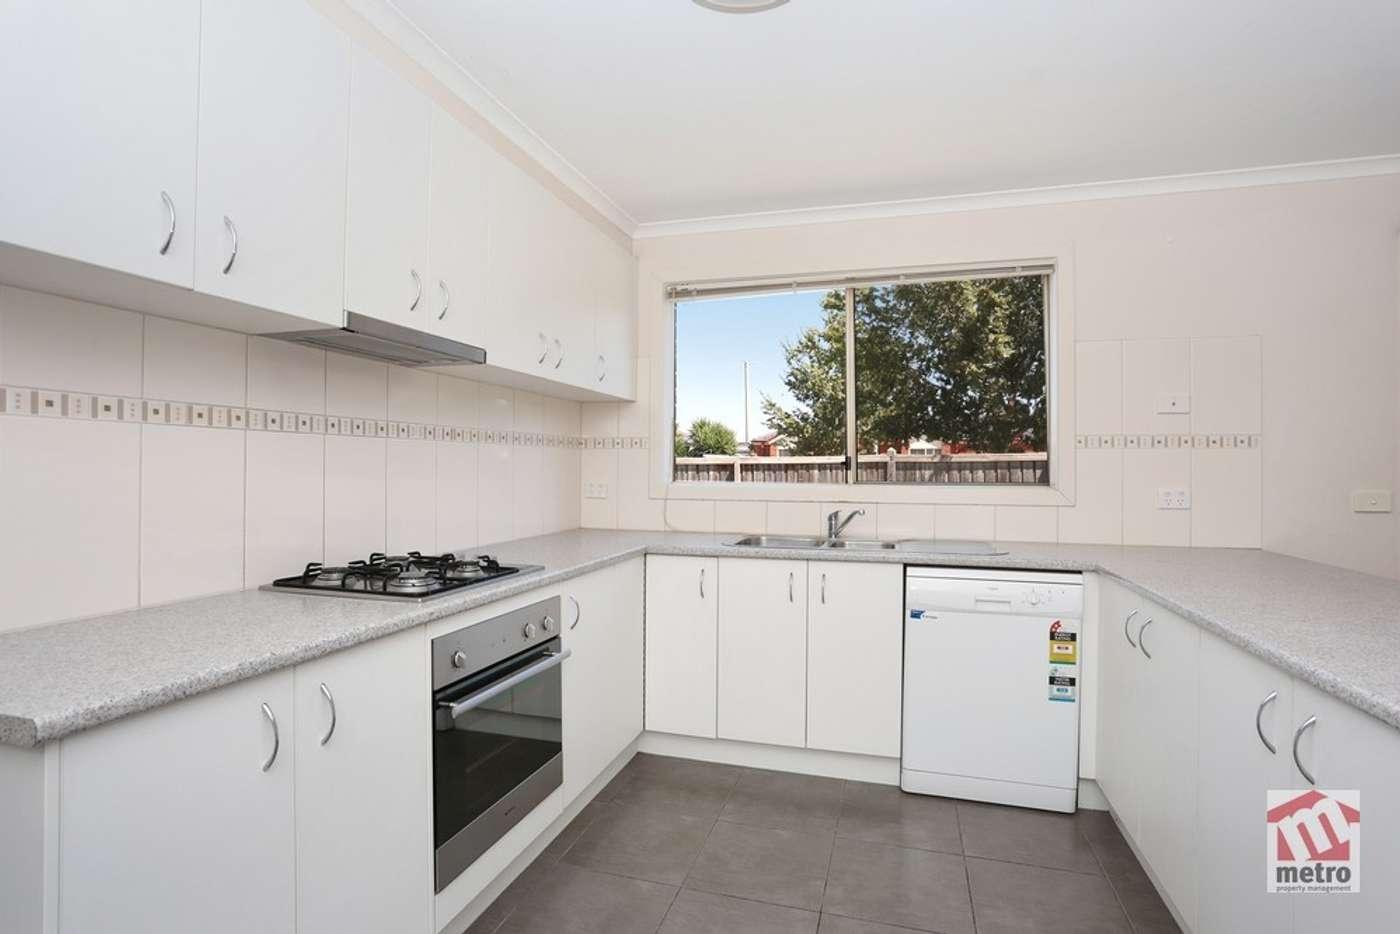 Main view of Homely house listing, 89 Barrington Lane, Sunbury VIC 3429